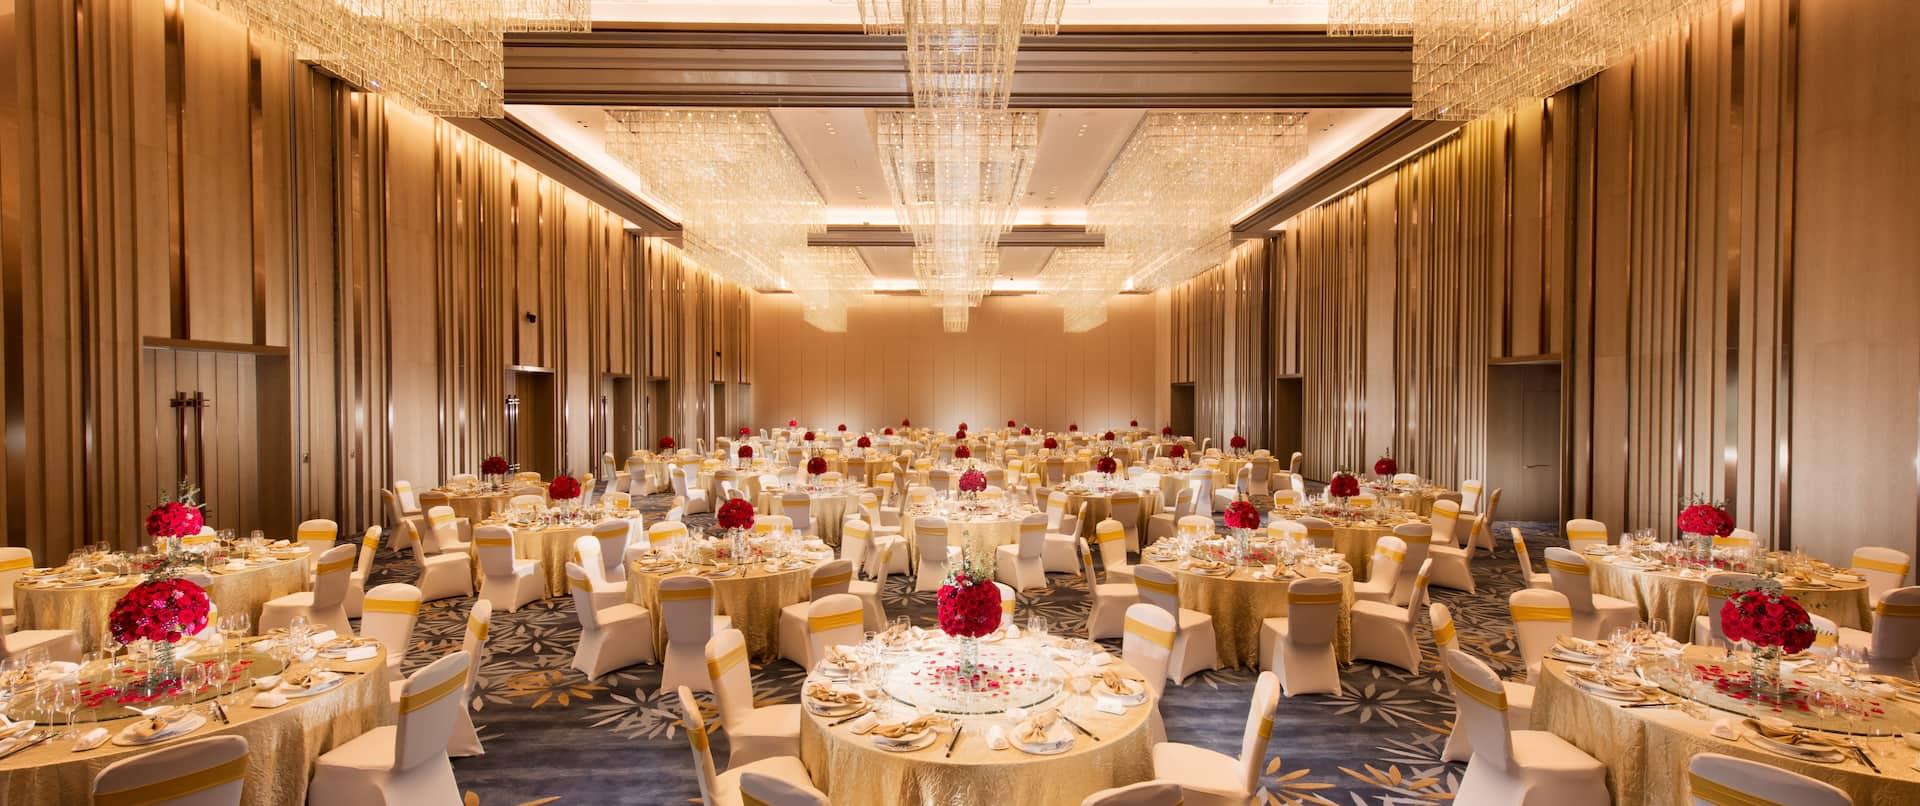 Grand Ballroom Wedding Room